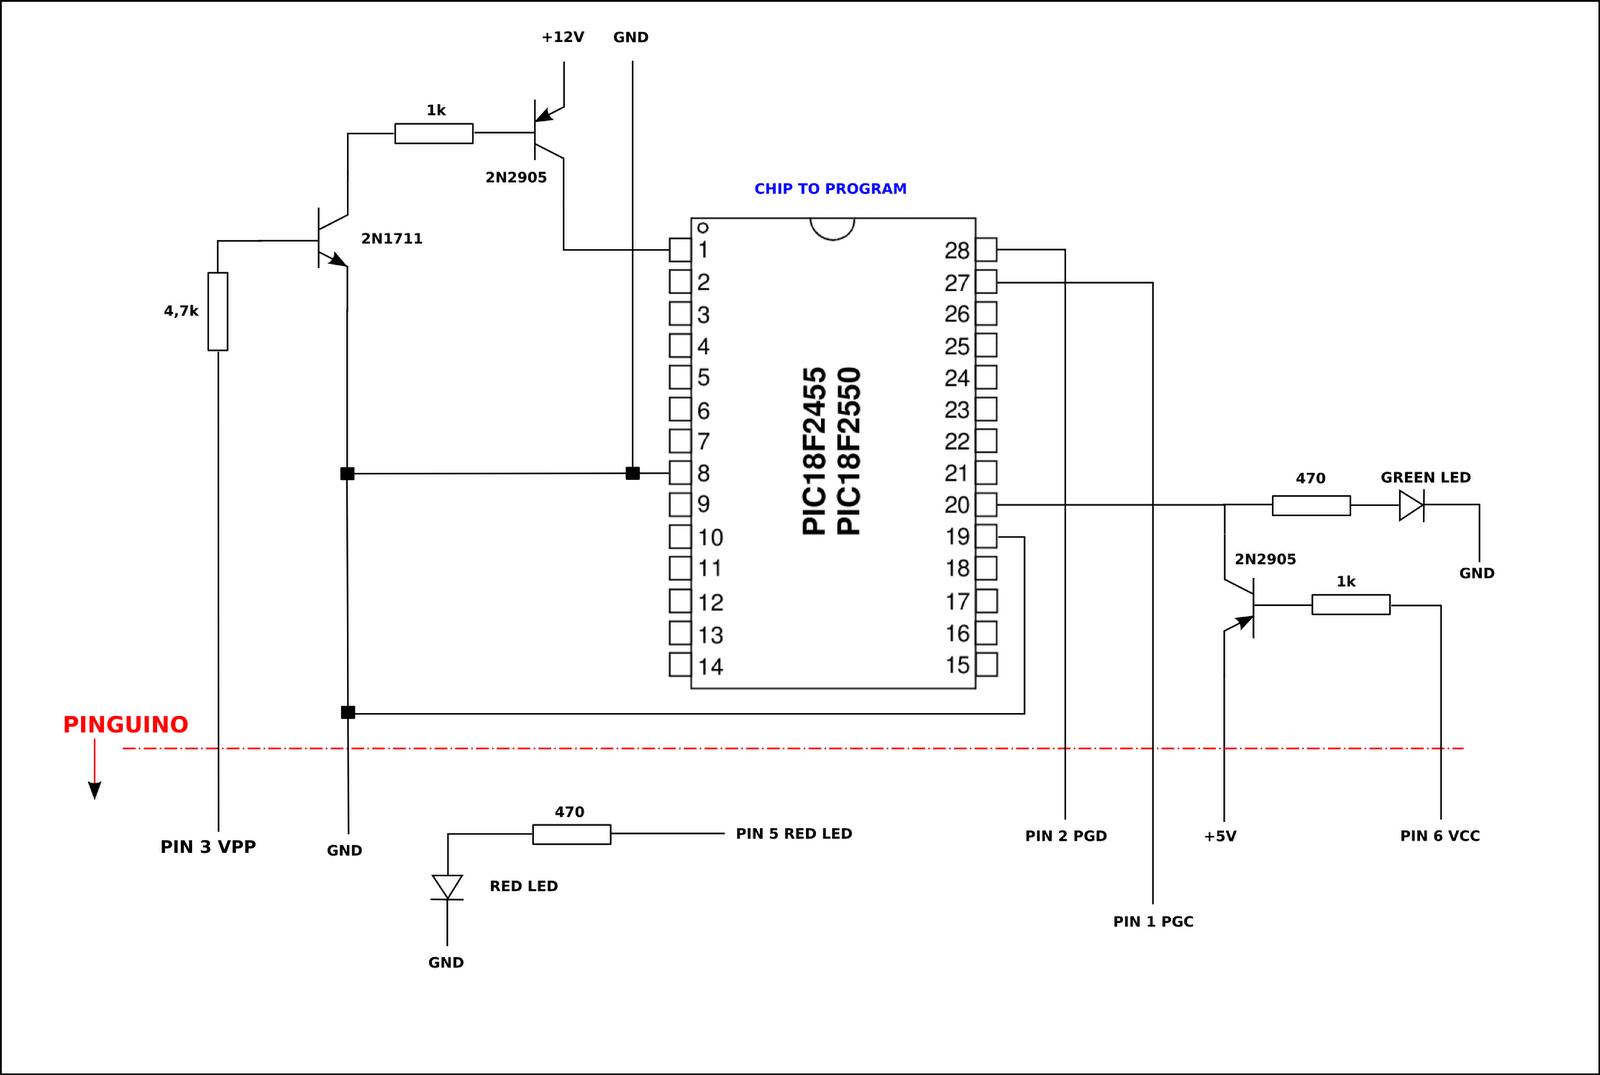 Build Pinguino Cat5 Network Wiring Diagrams Http Wwwabacusposcom Networkwiring Schematic